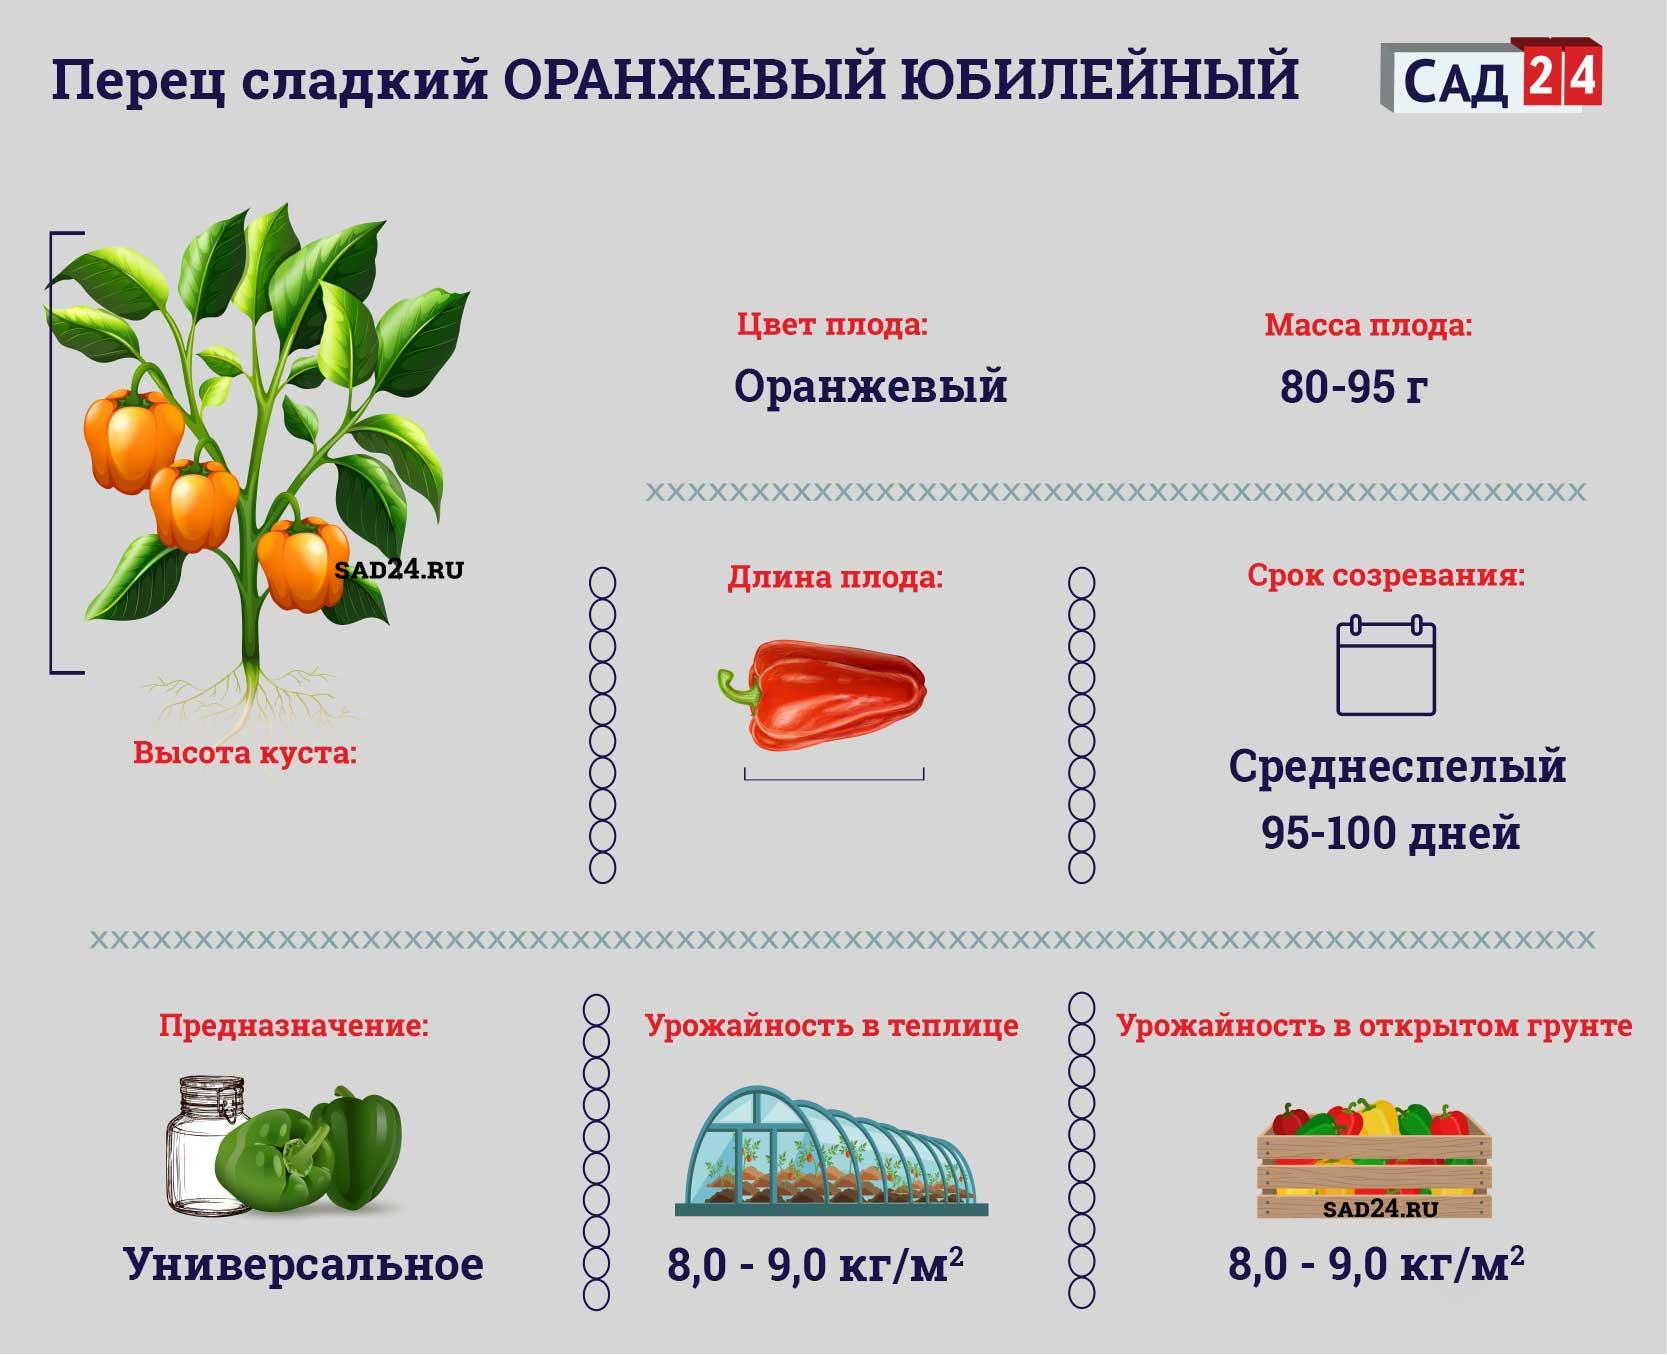 Оранжевый юбилейный https://sad24.ru/